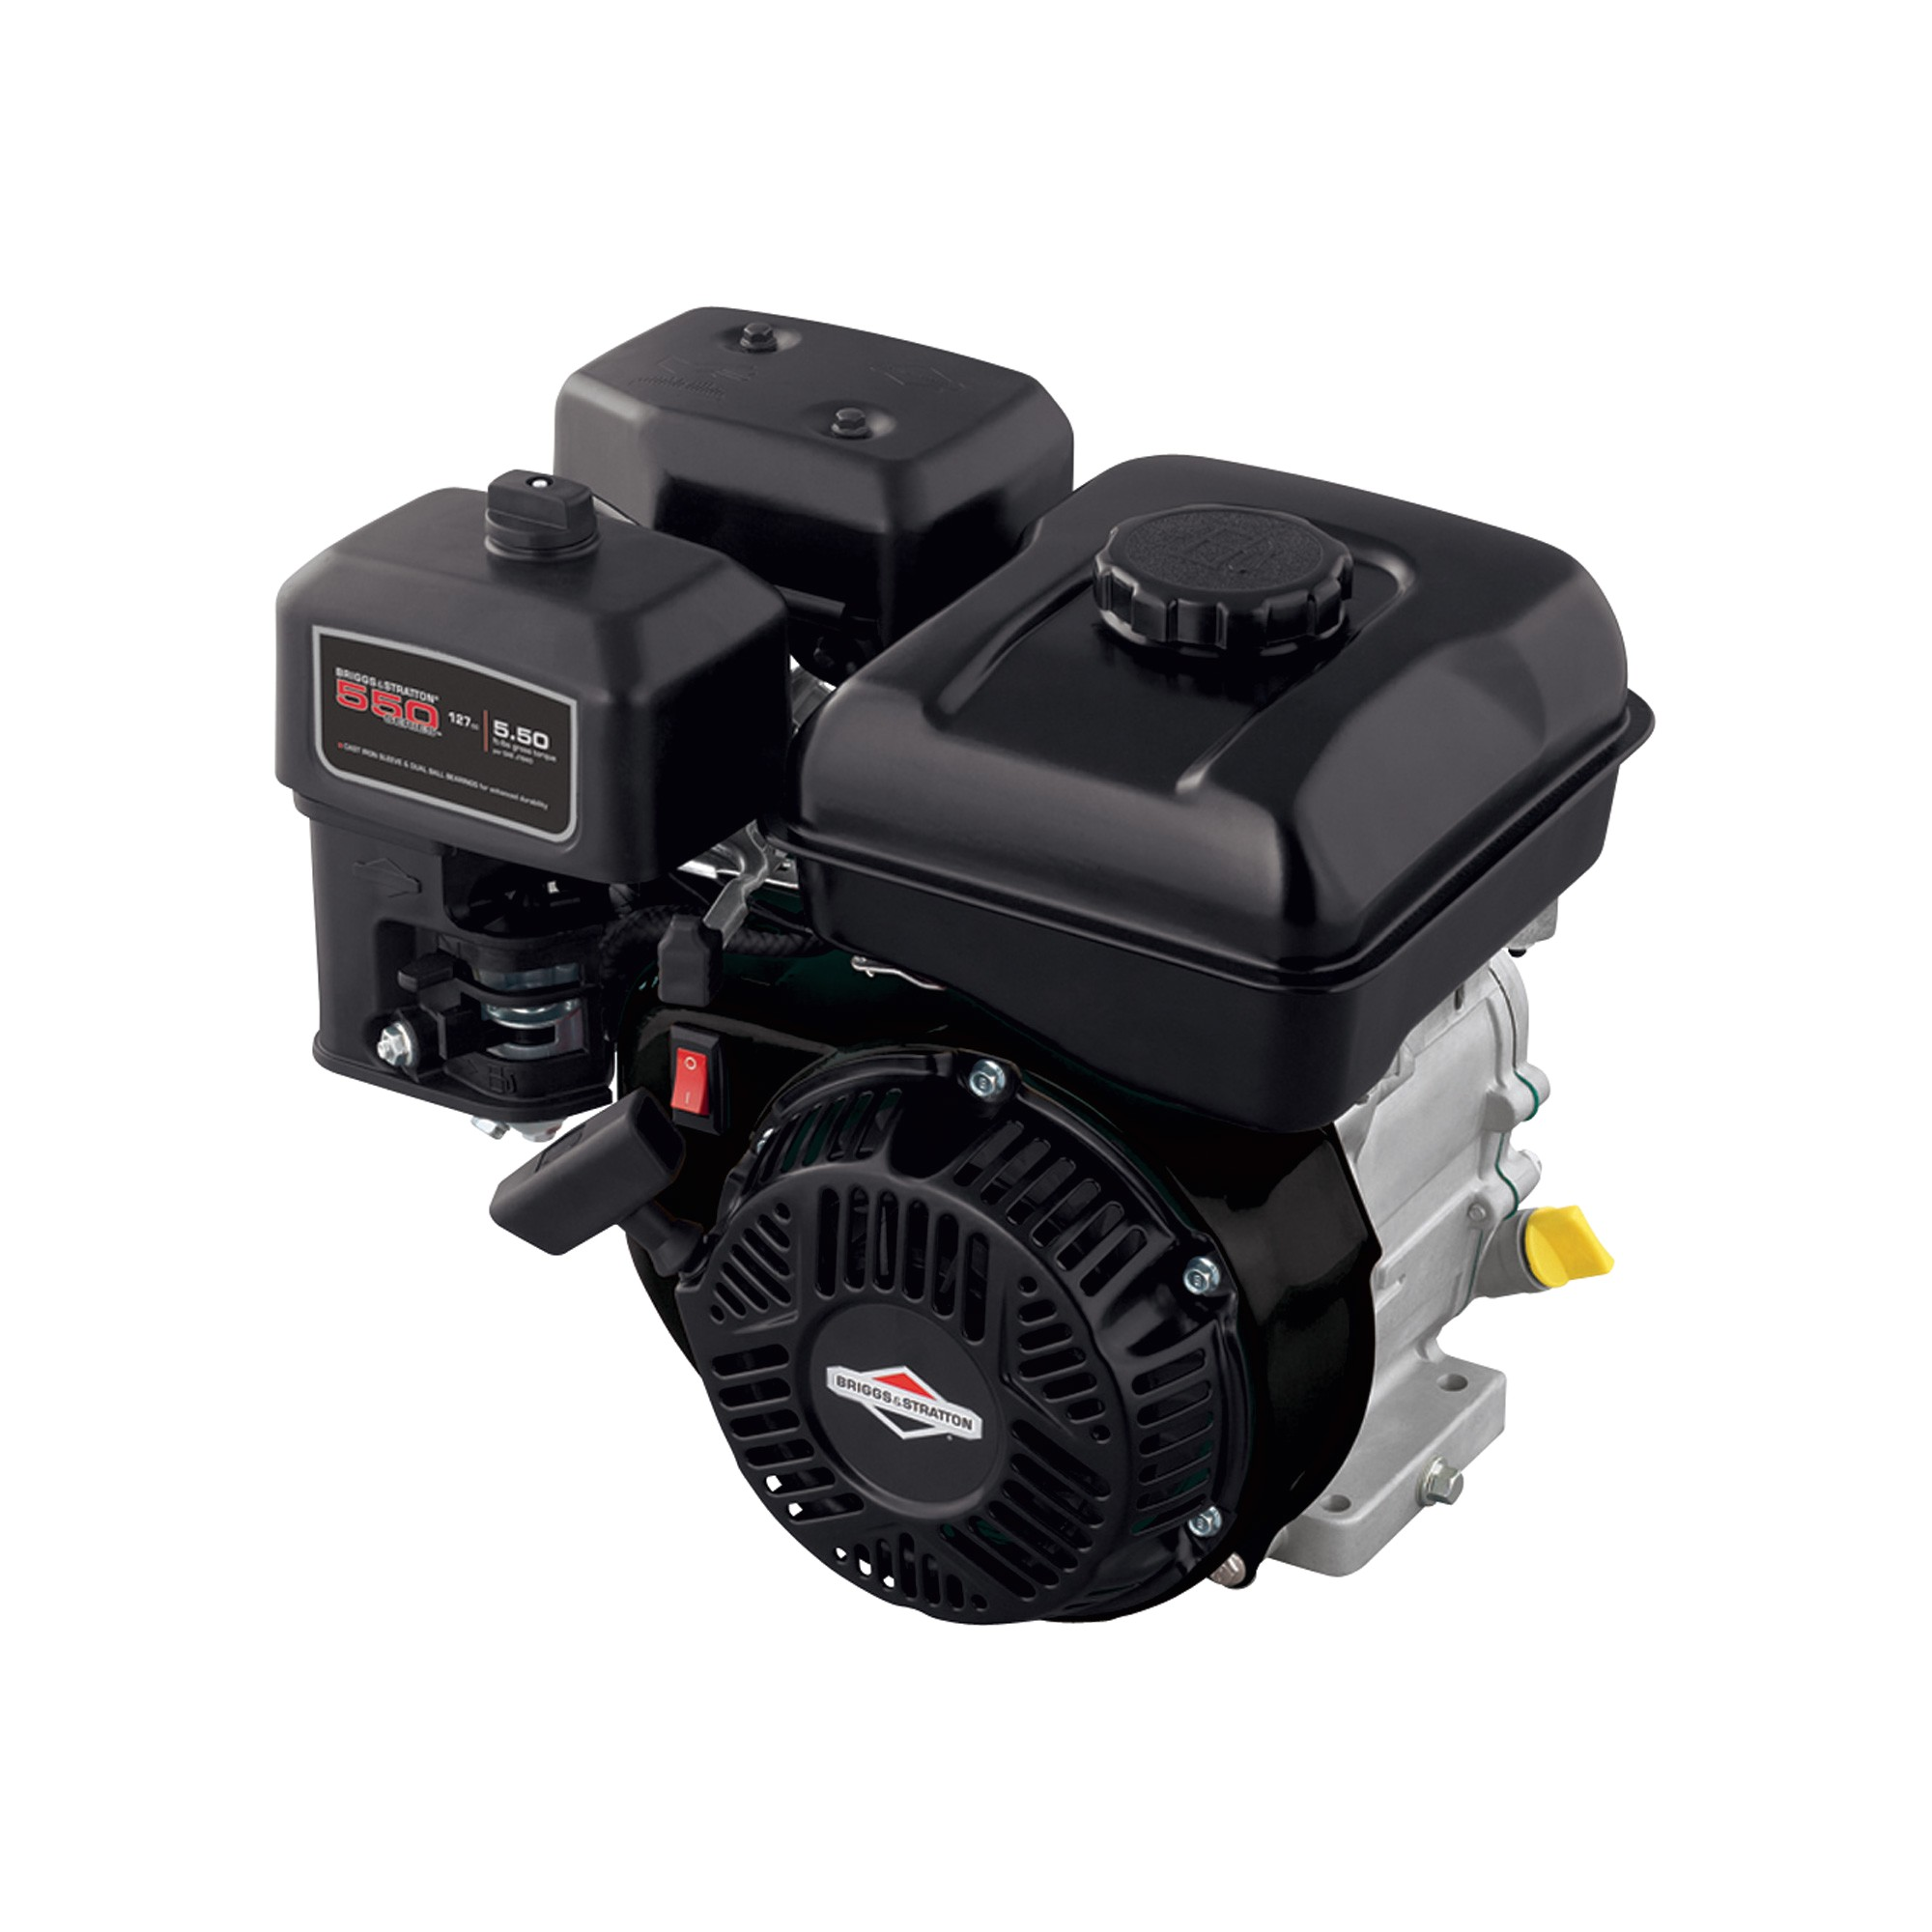 briggs stratton 550 series horizontal ohv engine 127cc 5 8in x